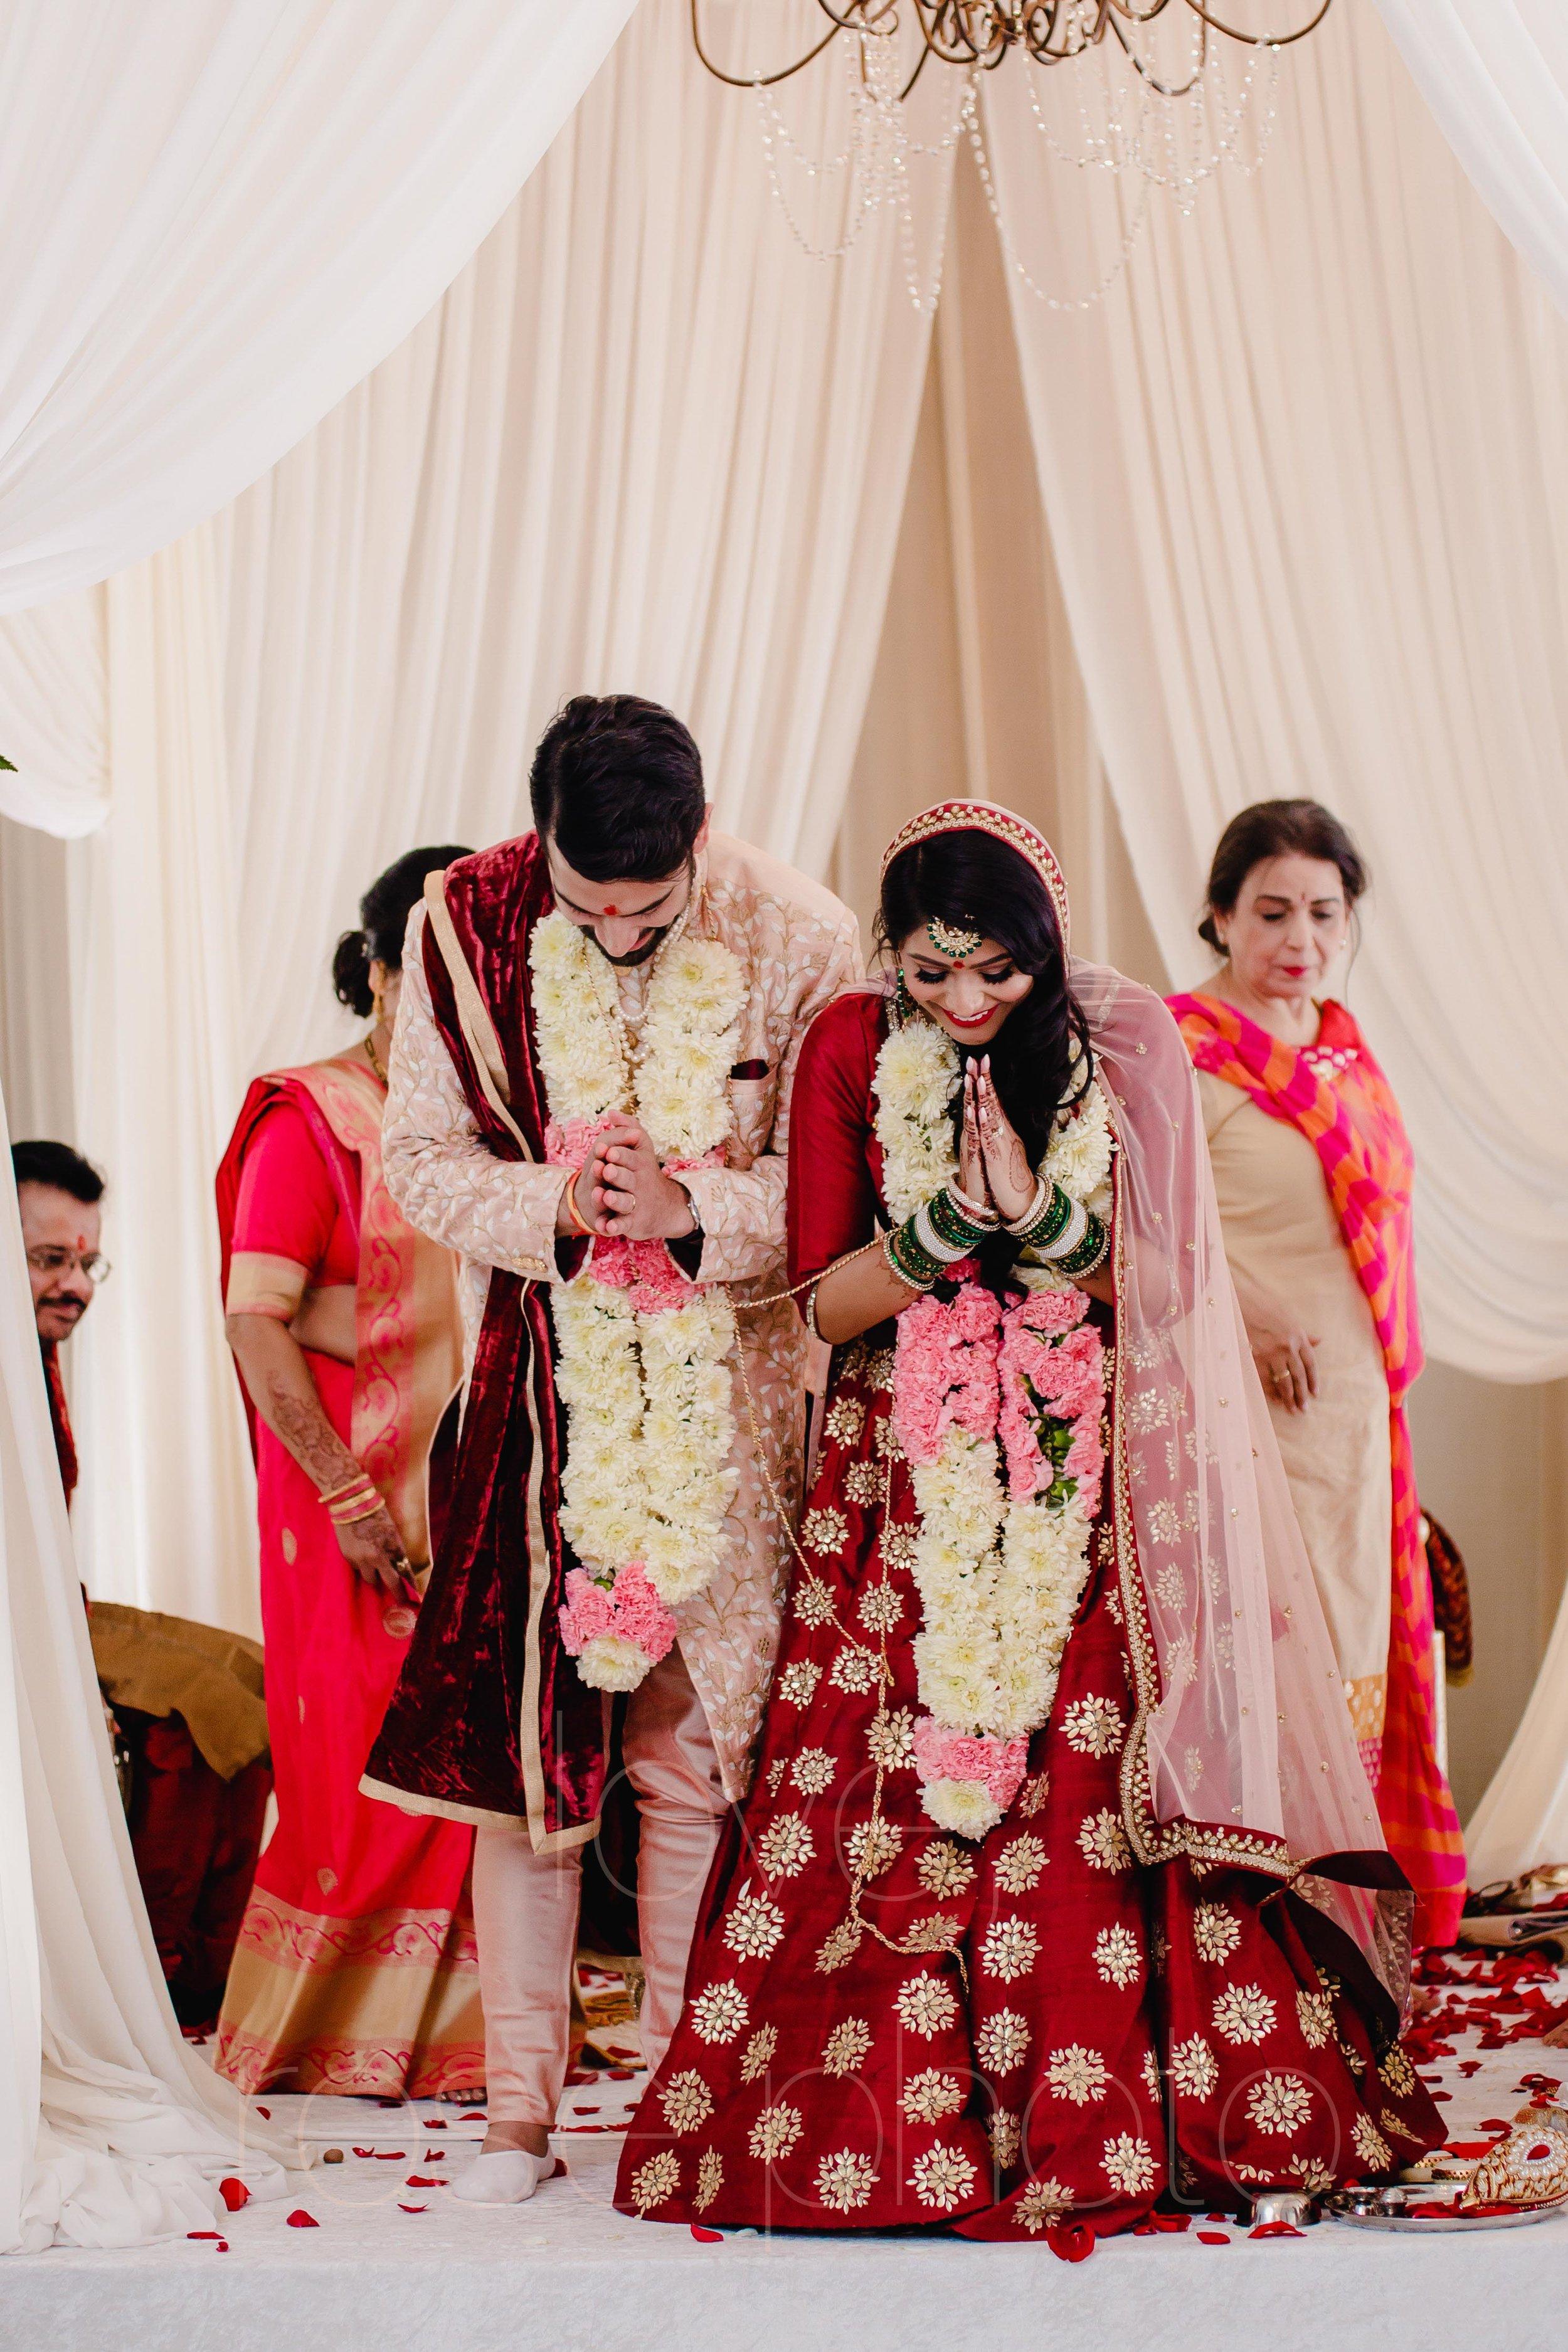 Chicago Indian Wedding best photography lifestyle wedding portrait luxury wedding-40.jpg